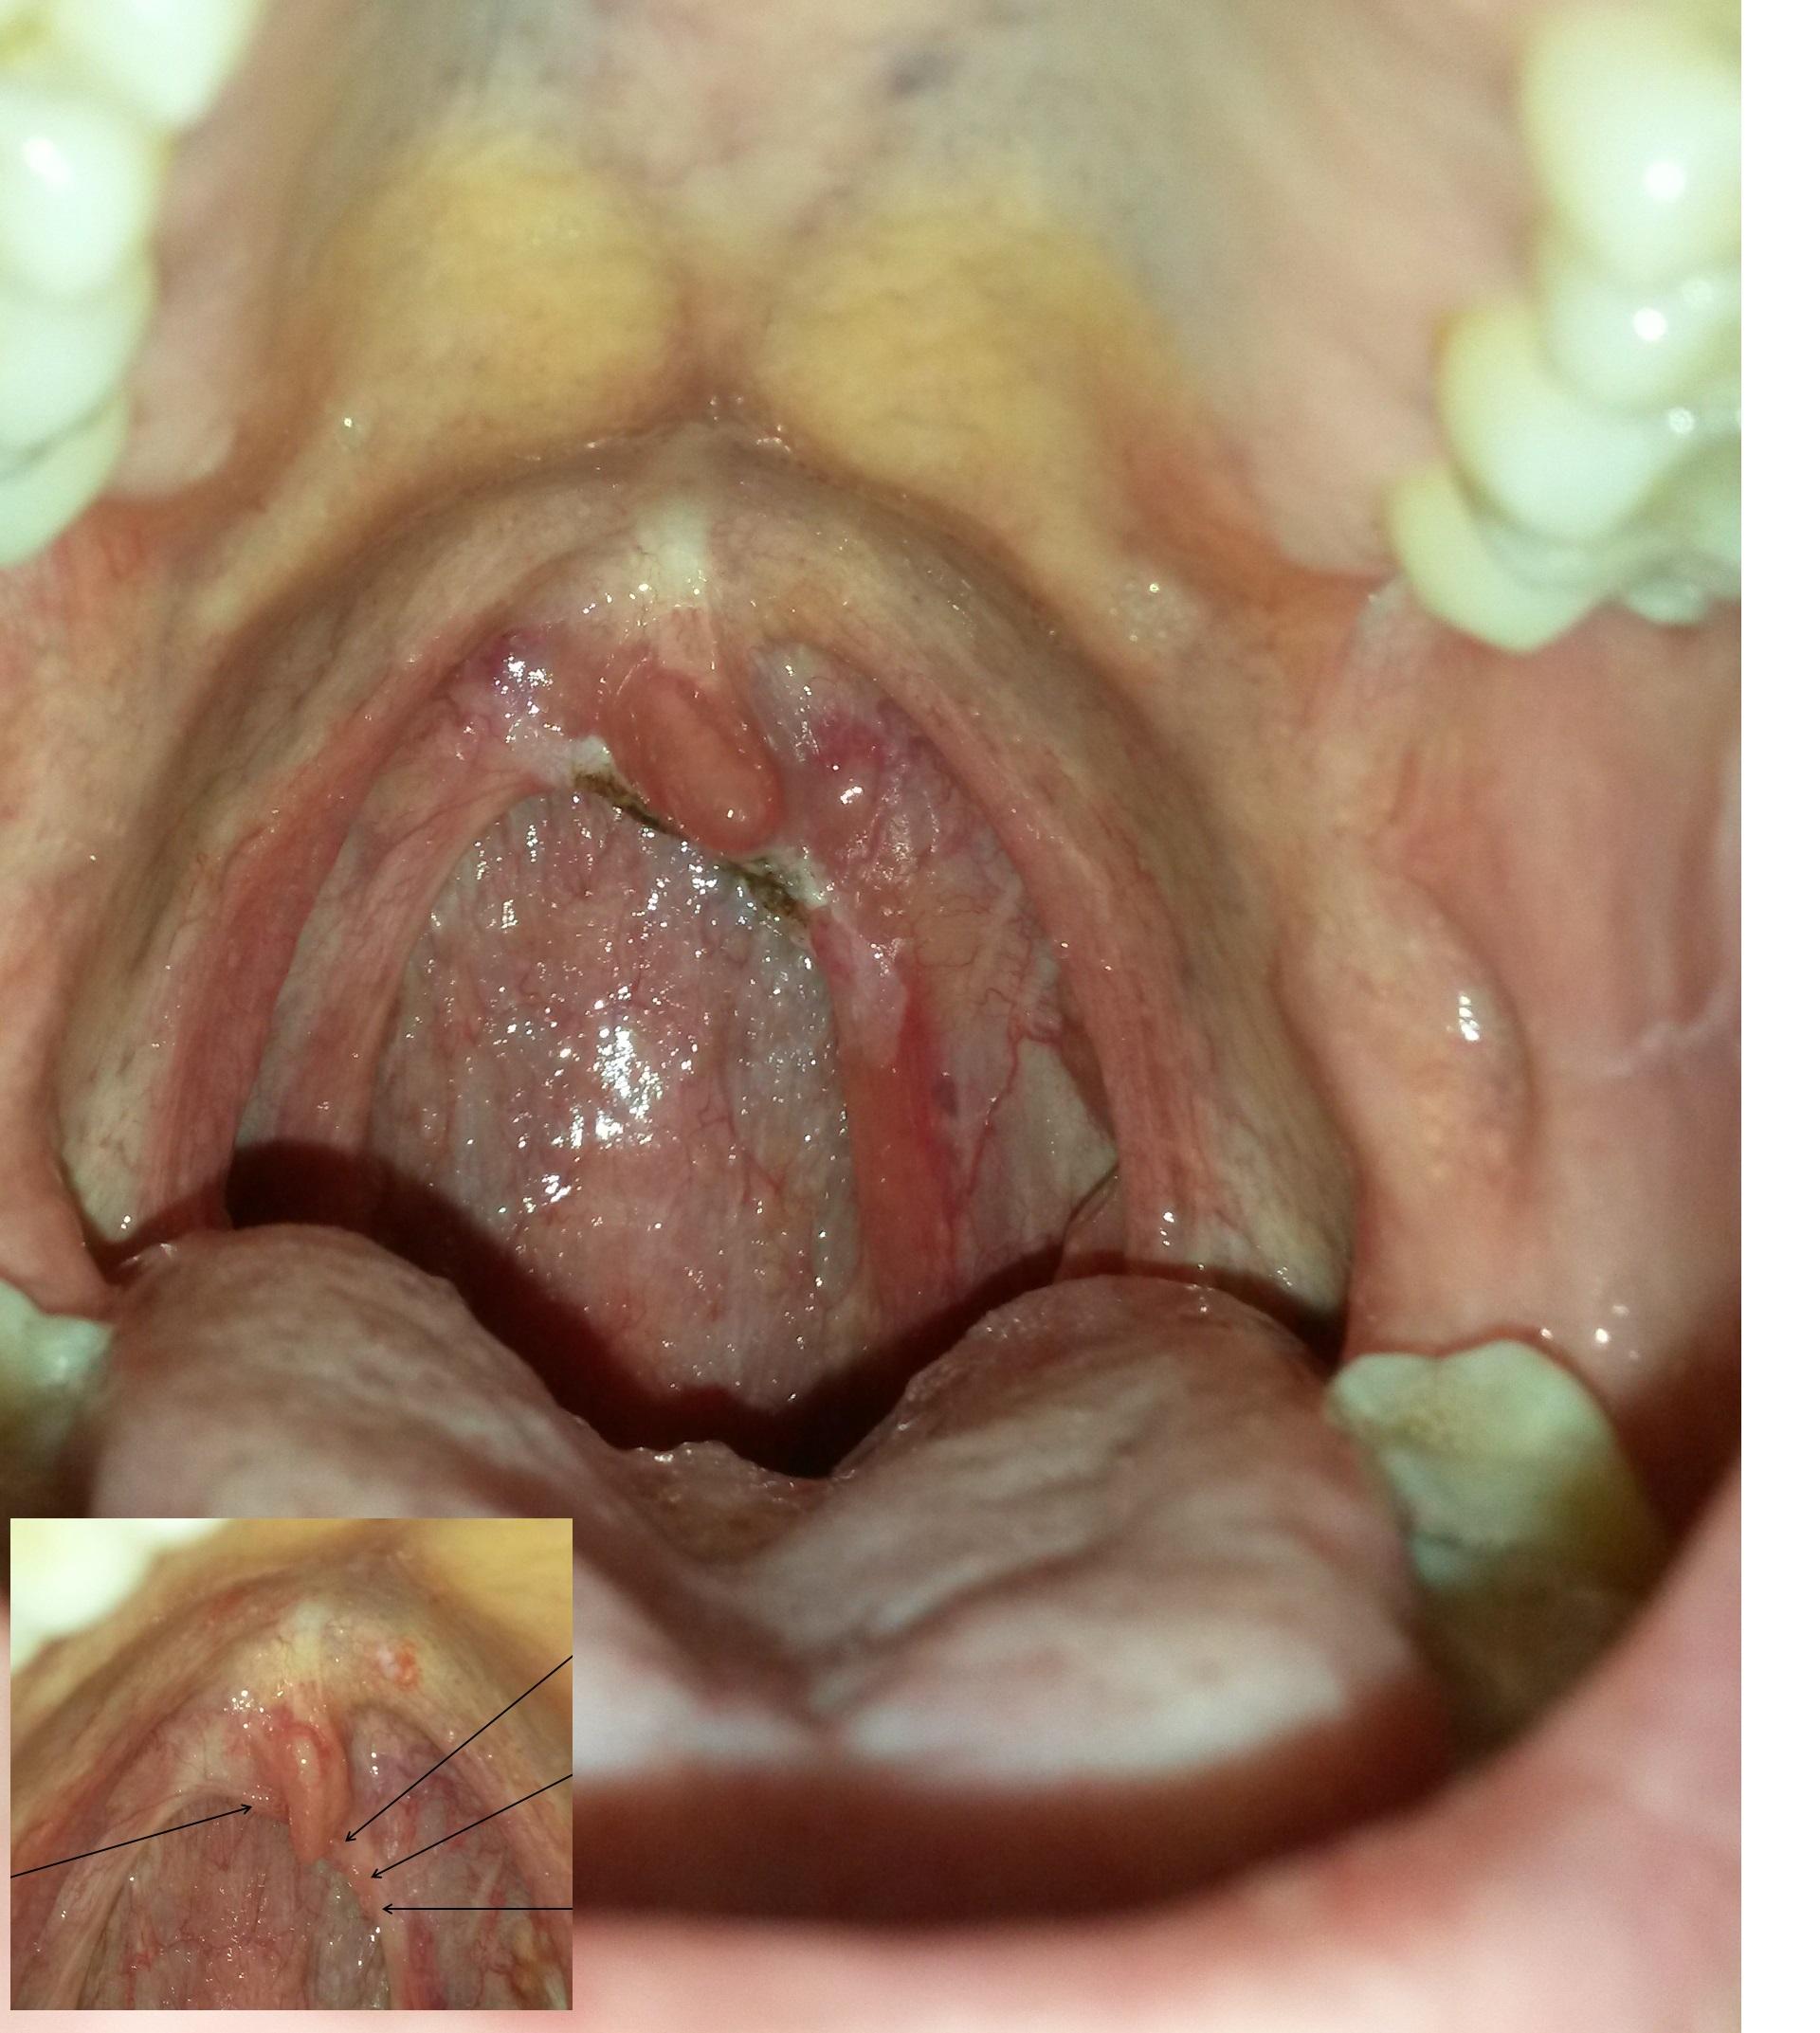 hpv warts throat treatment